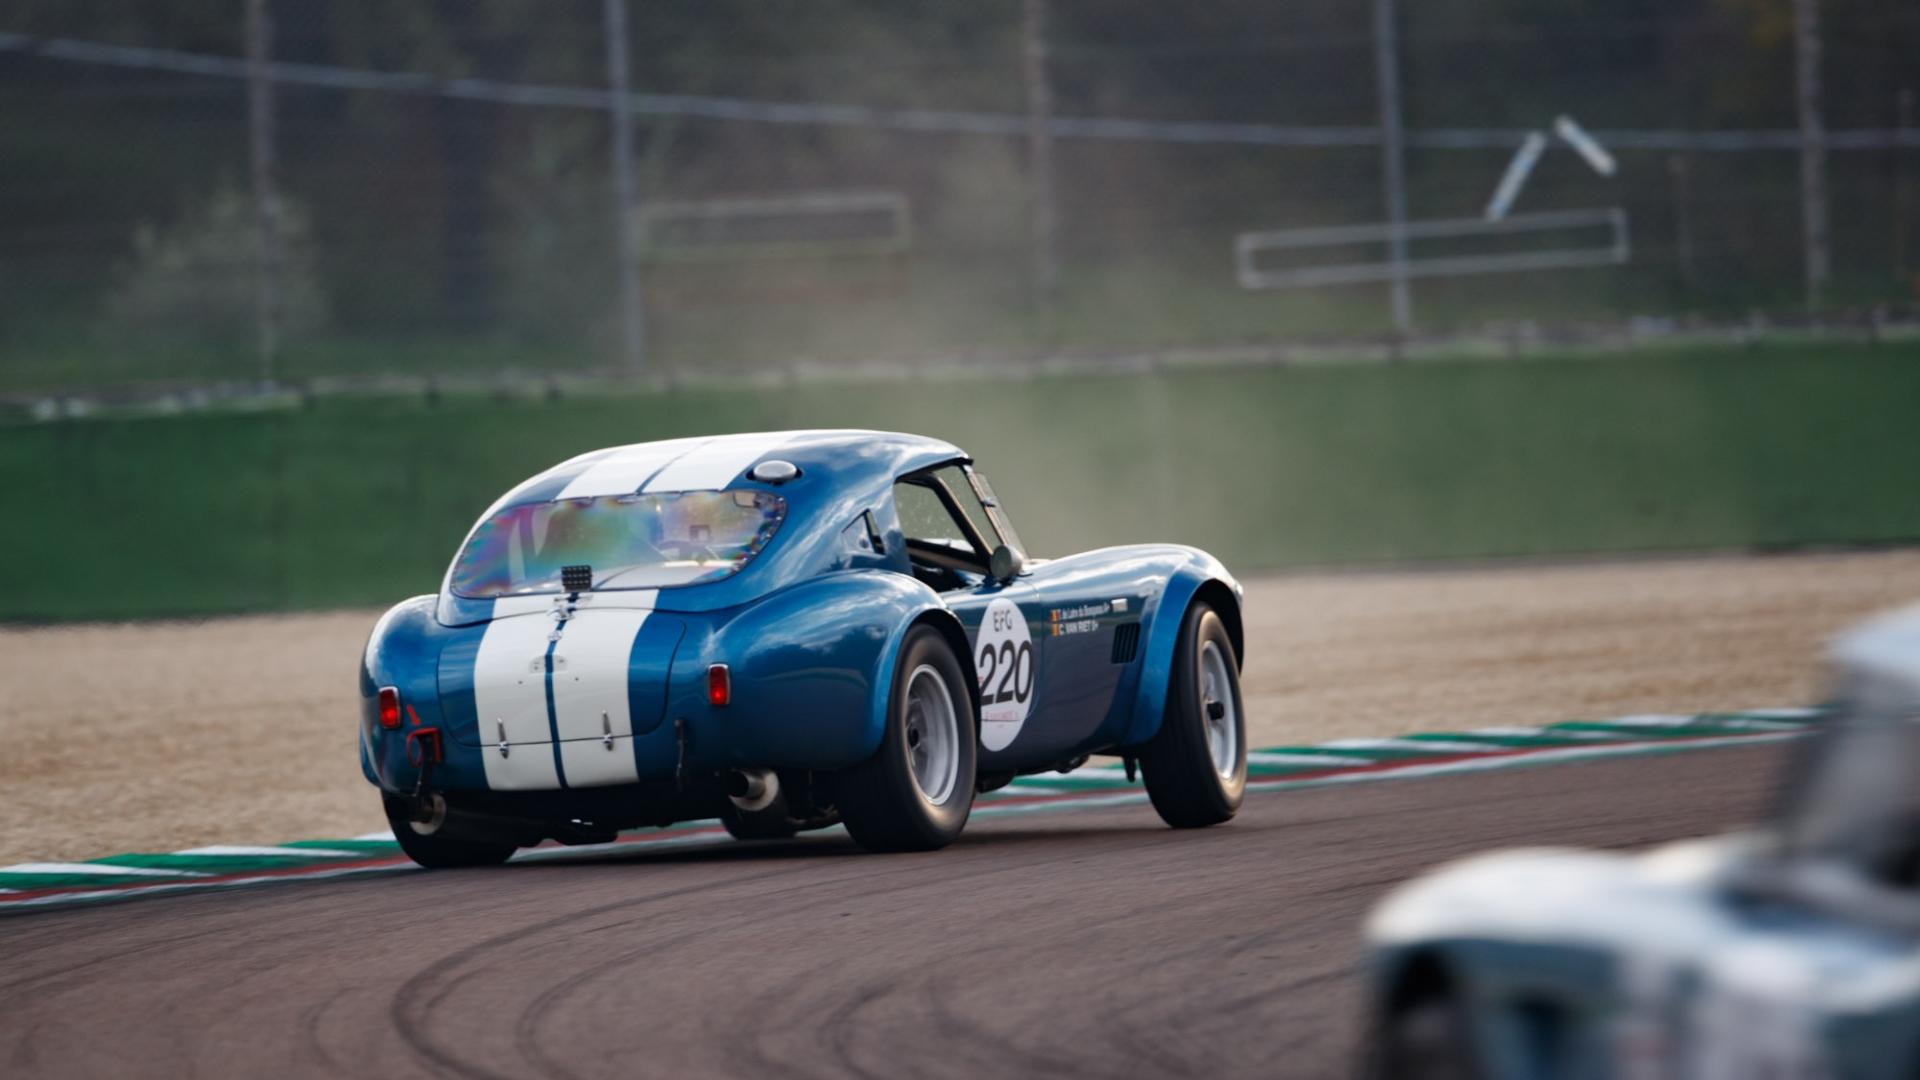 Imola-Classic : la Shelby Cobra 289 remporte le titre Sixties' Endurance · Gipimotor